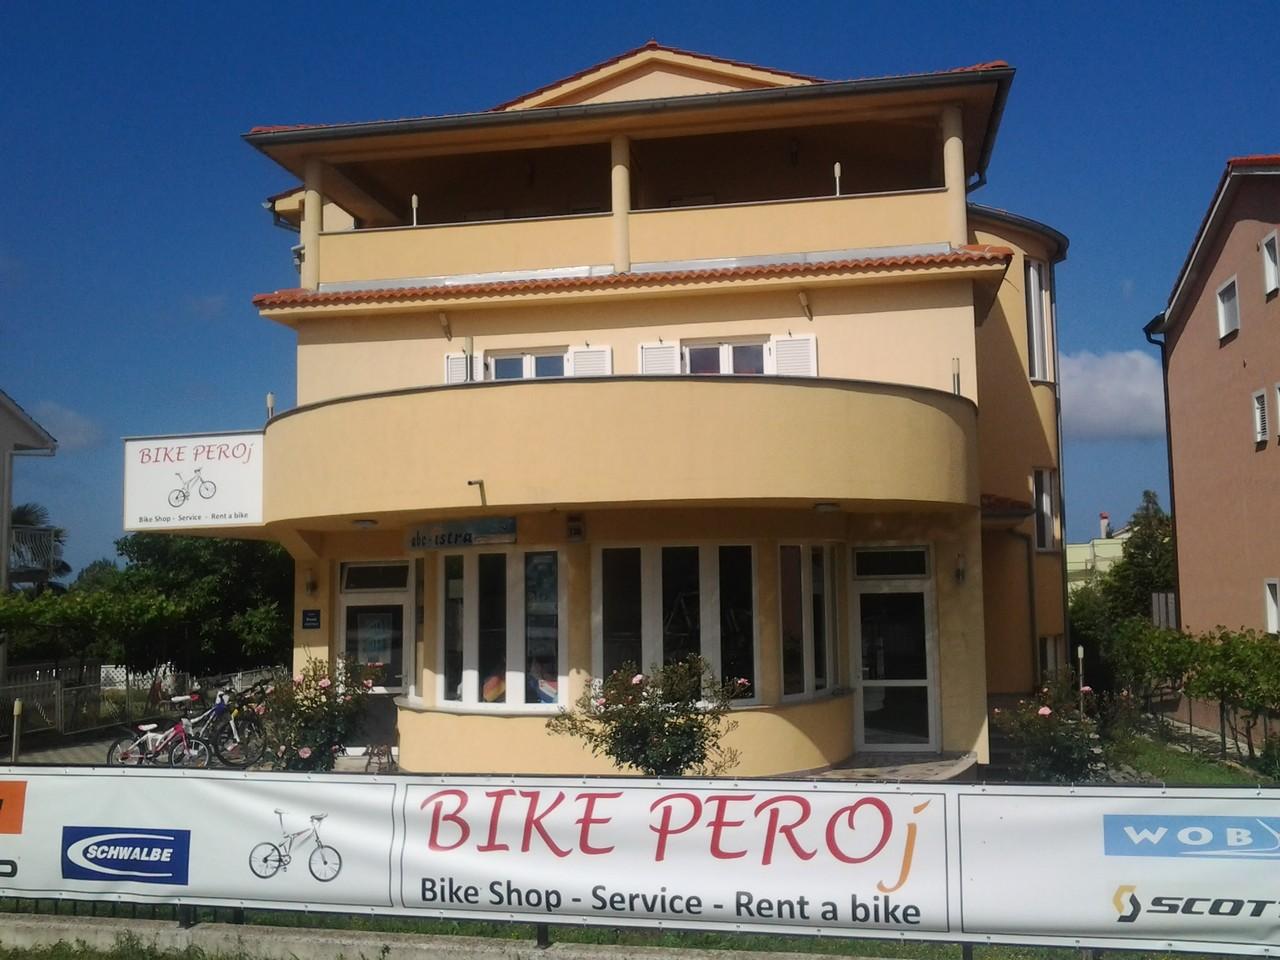 Bike Peroj